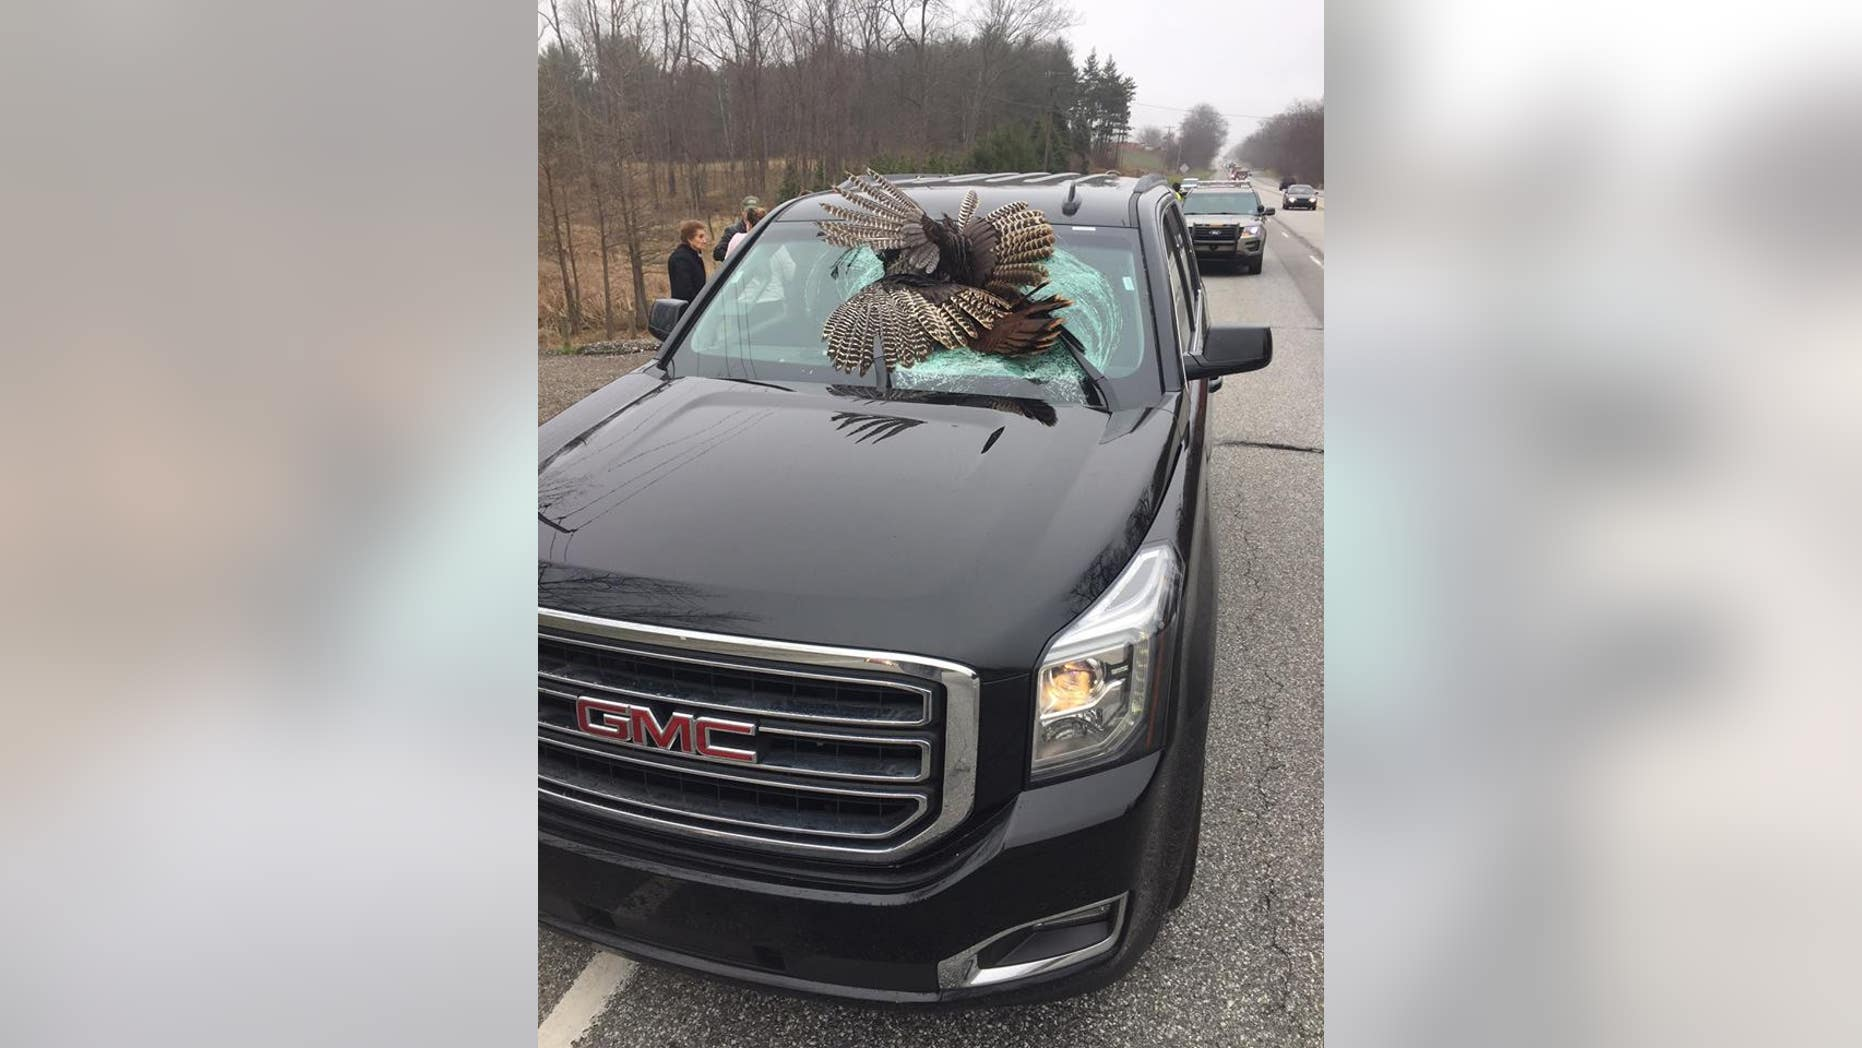 Wild turkey crashes through family's windshield in northern Indiana.